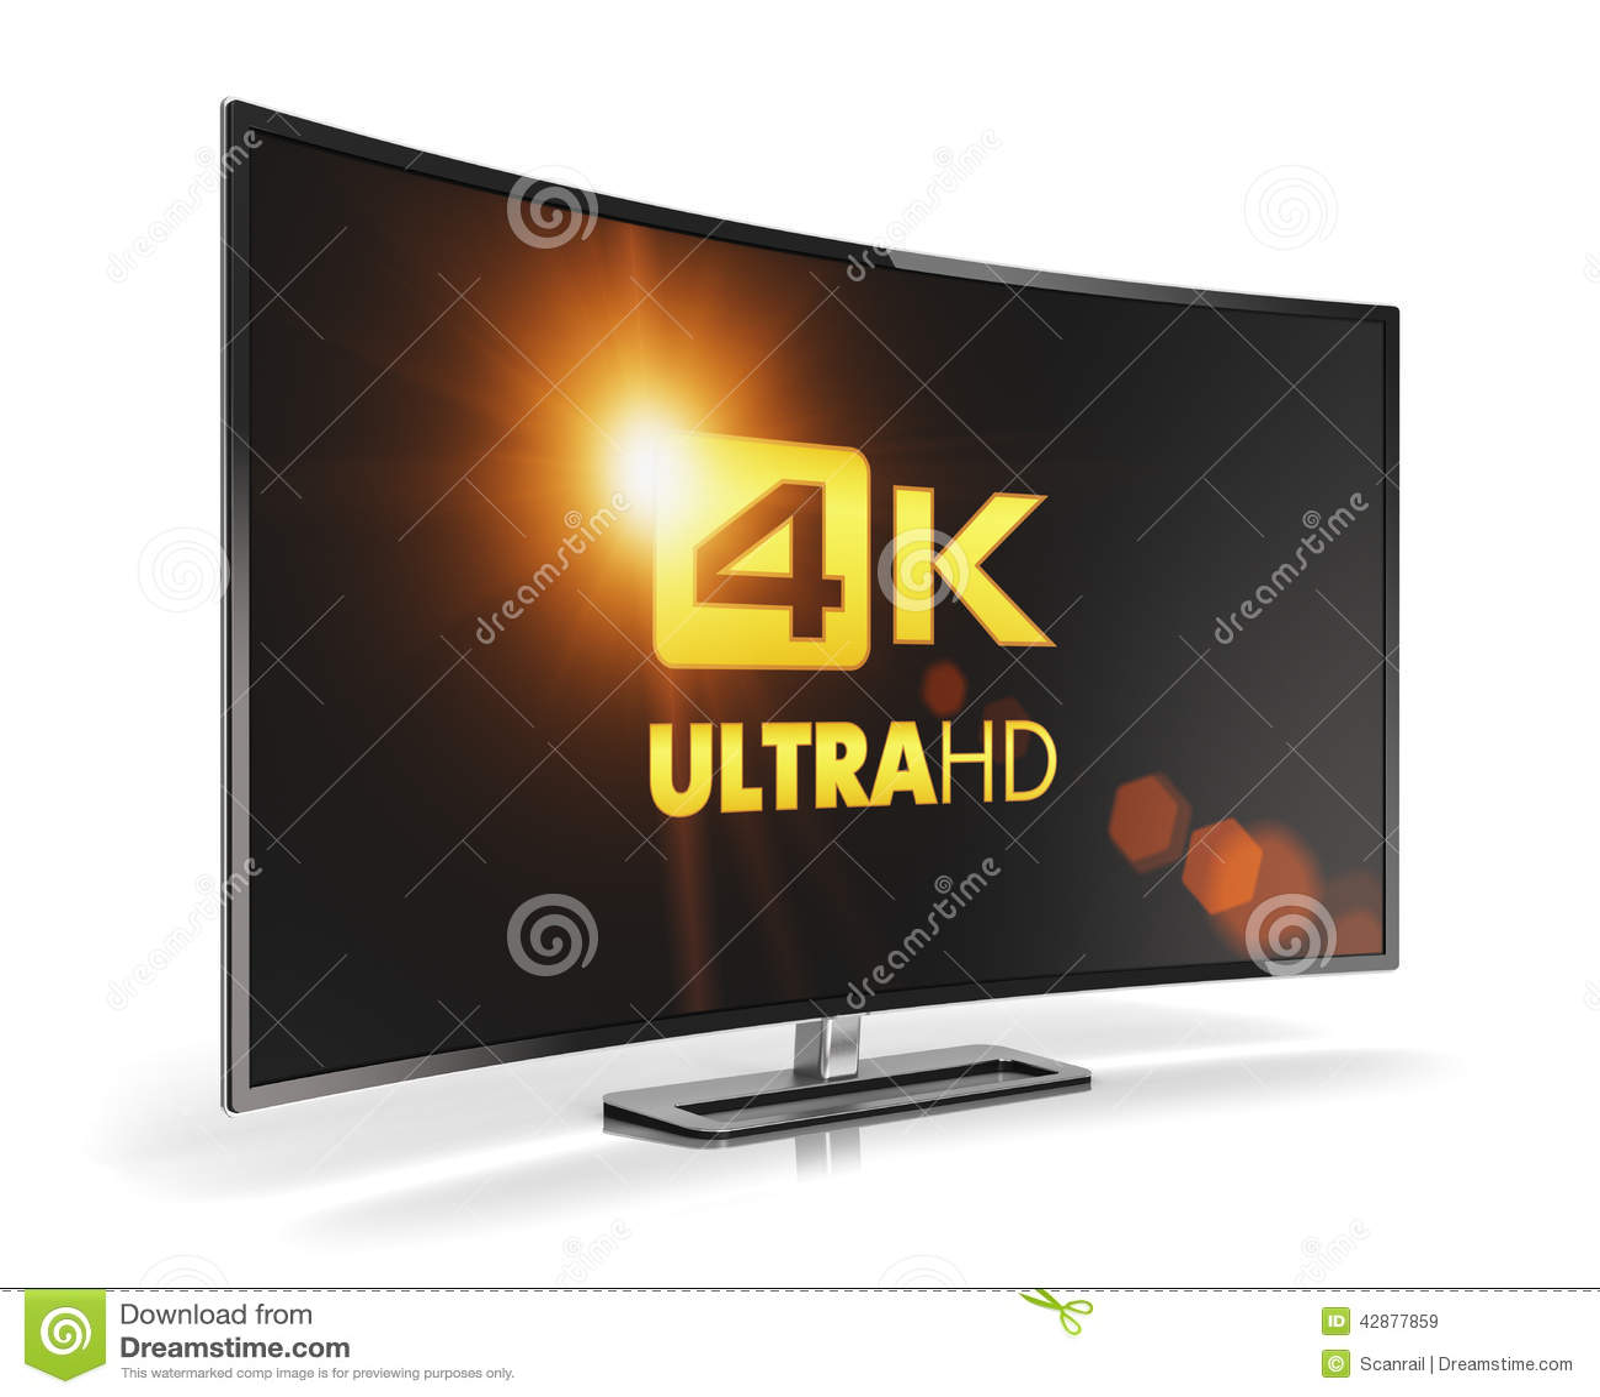 Curved 4K UltraHD TV Stock Illustration - Image: 42877859